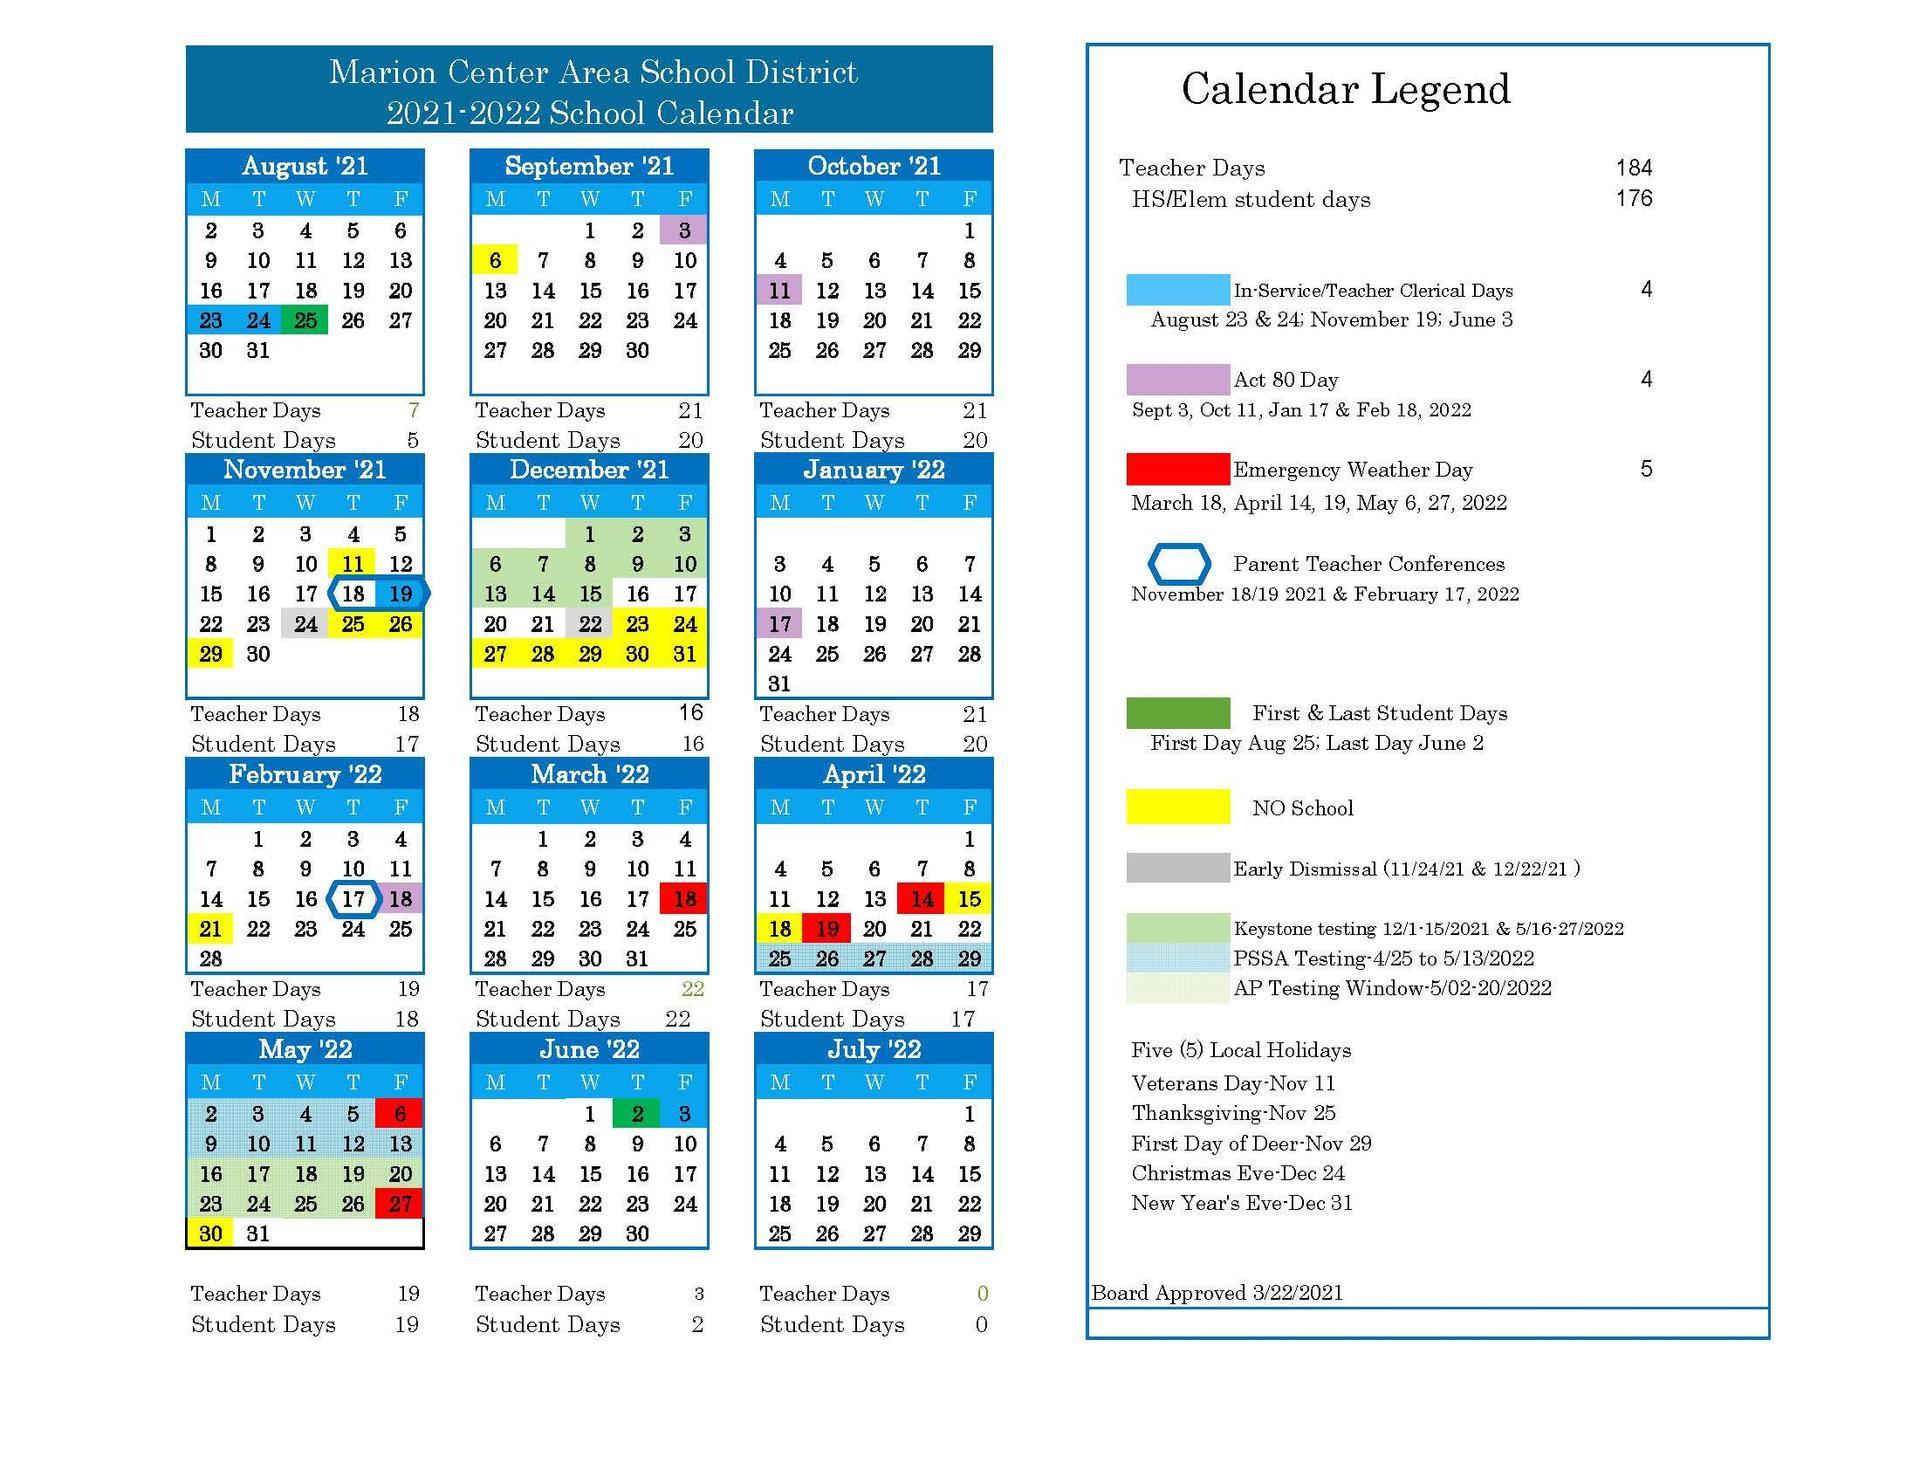 20-22 School calendar